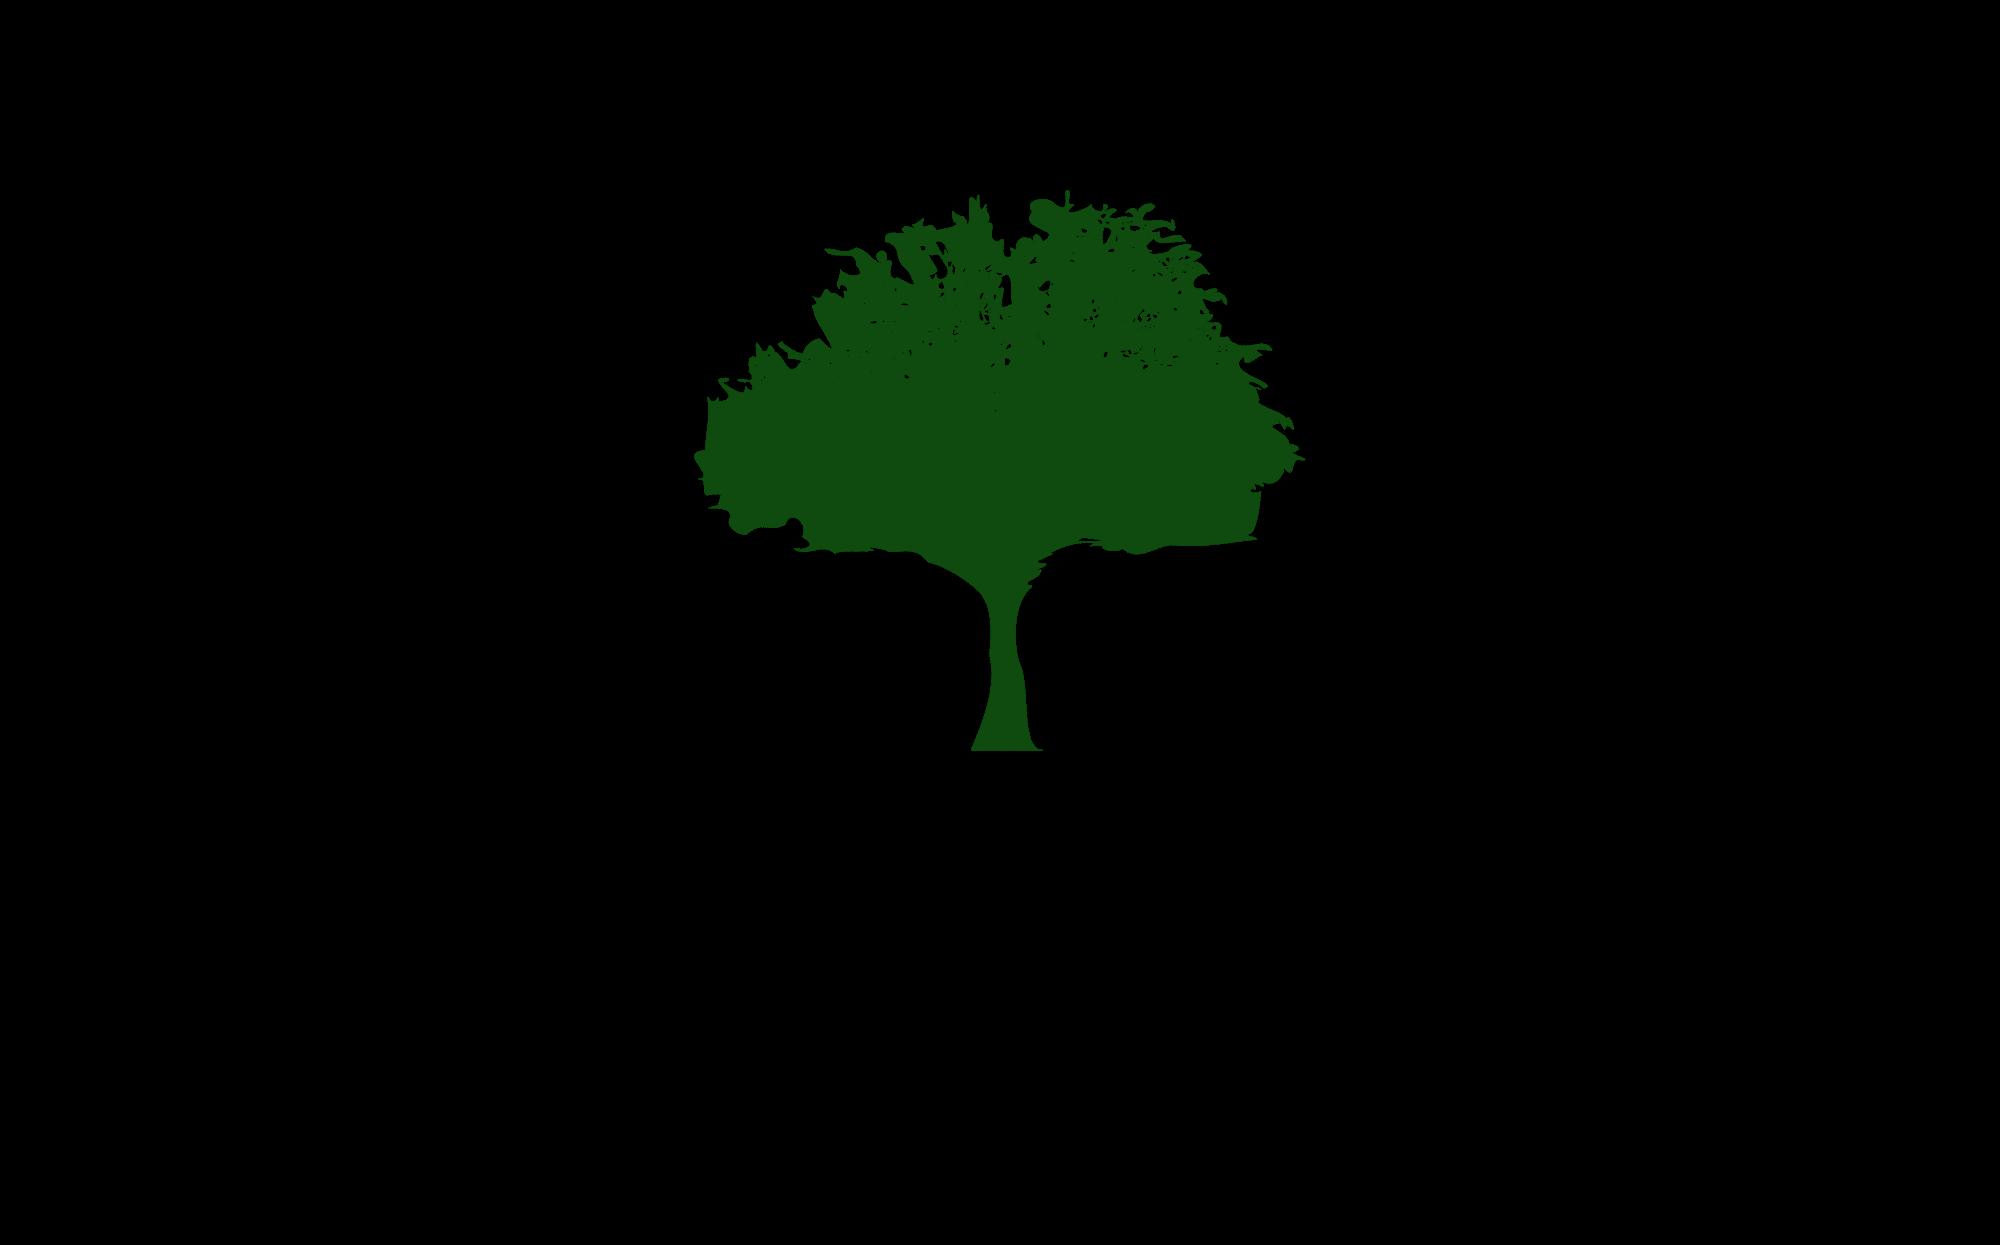 SimpleCraft-logo (1) - Copy.png